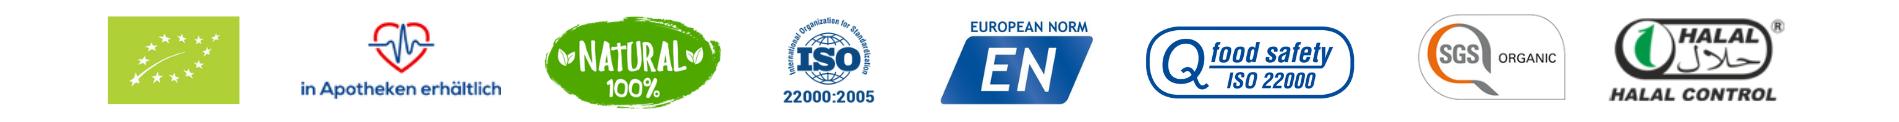 Tasnim Zertifizierungen - www.tasnim.eu